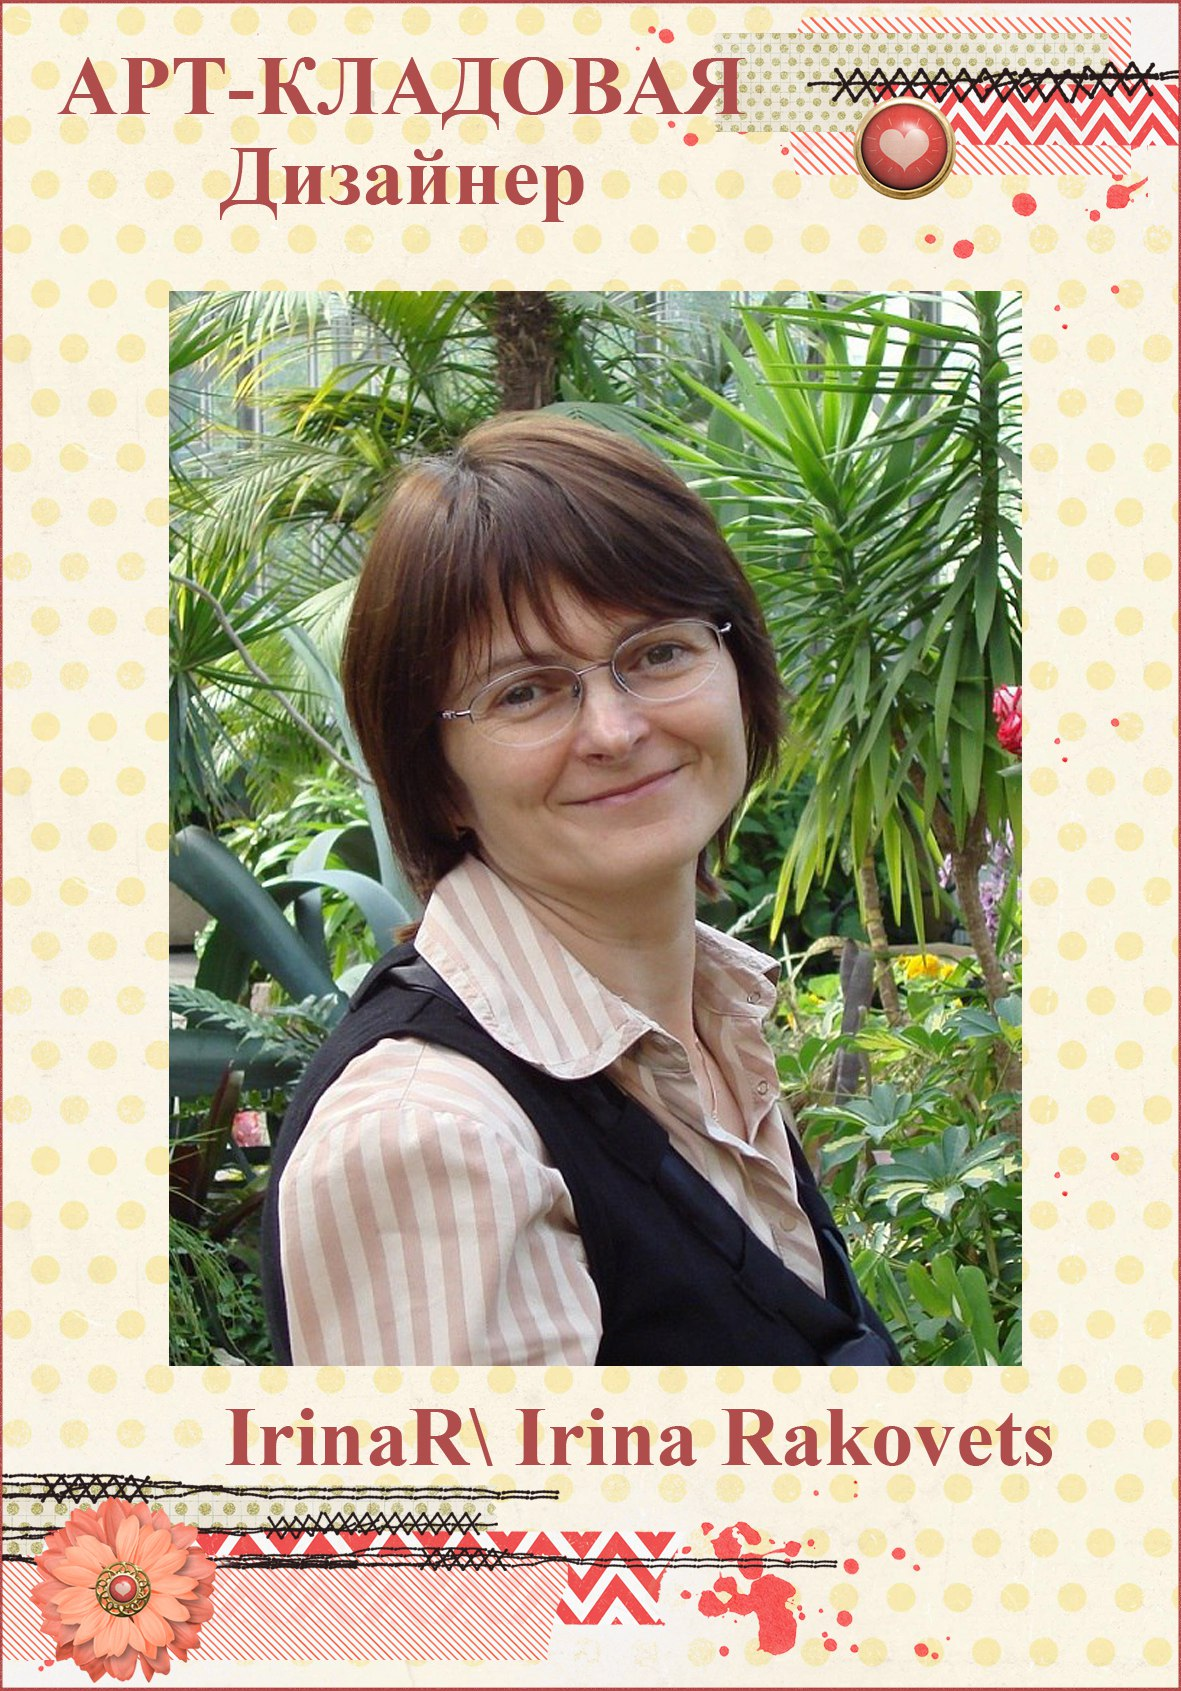 IrinaR (Irina Rakovets)